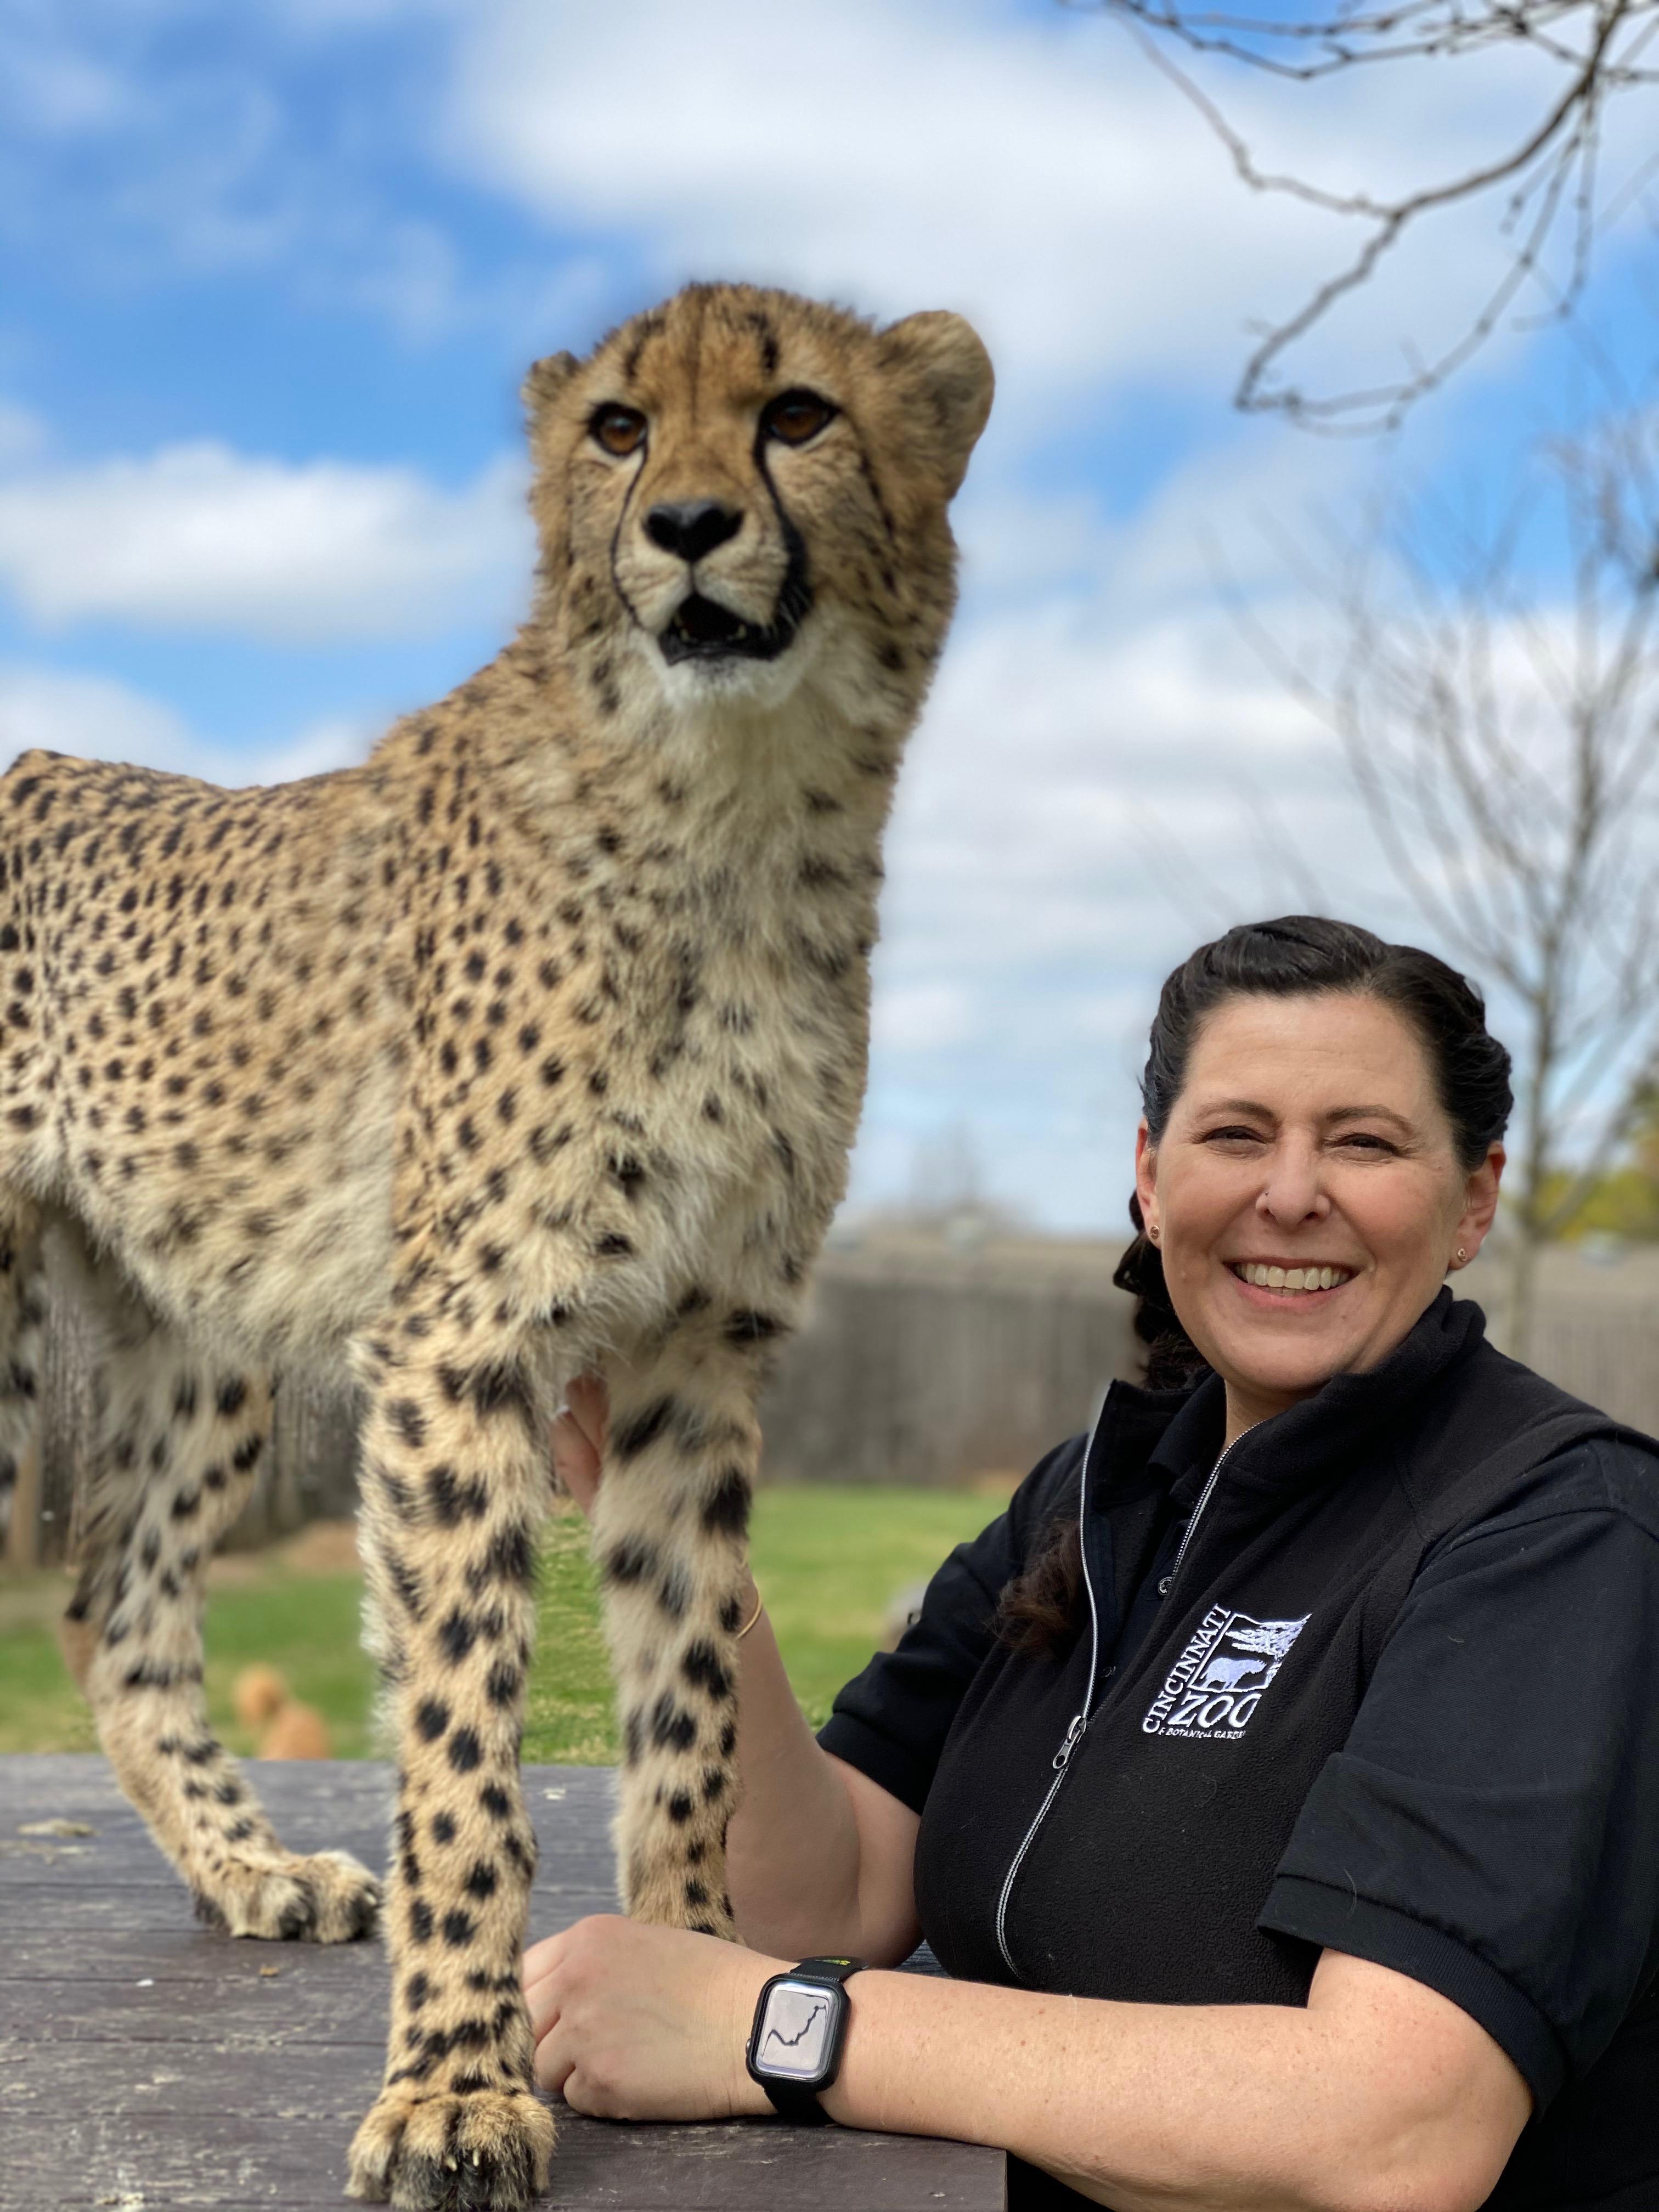 kris the cheetah rolls over